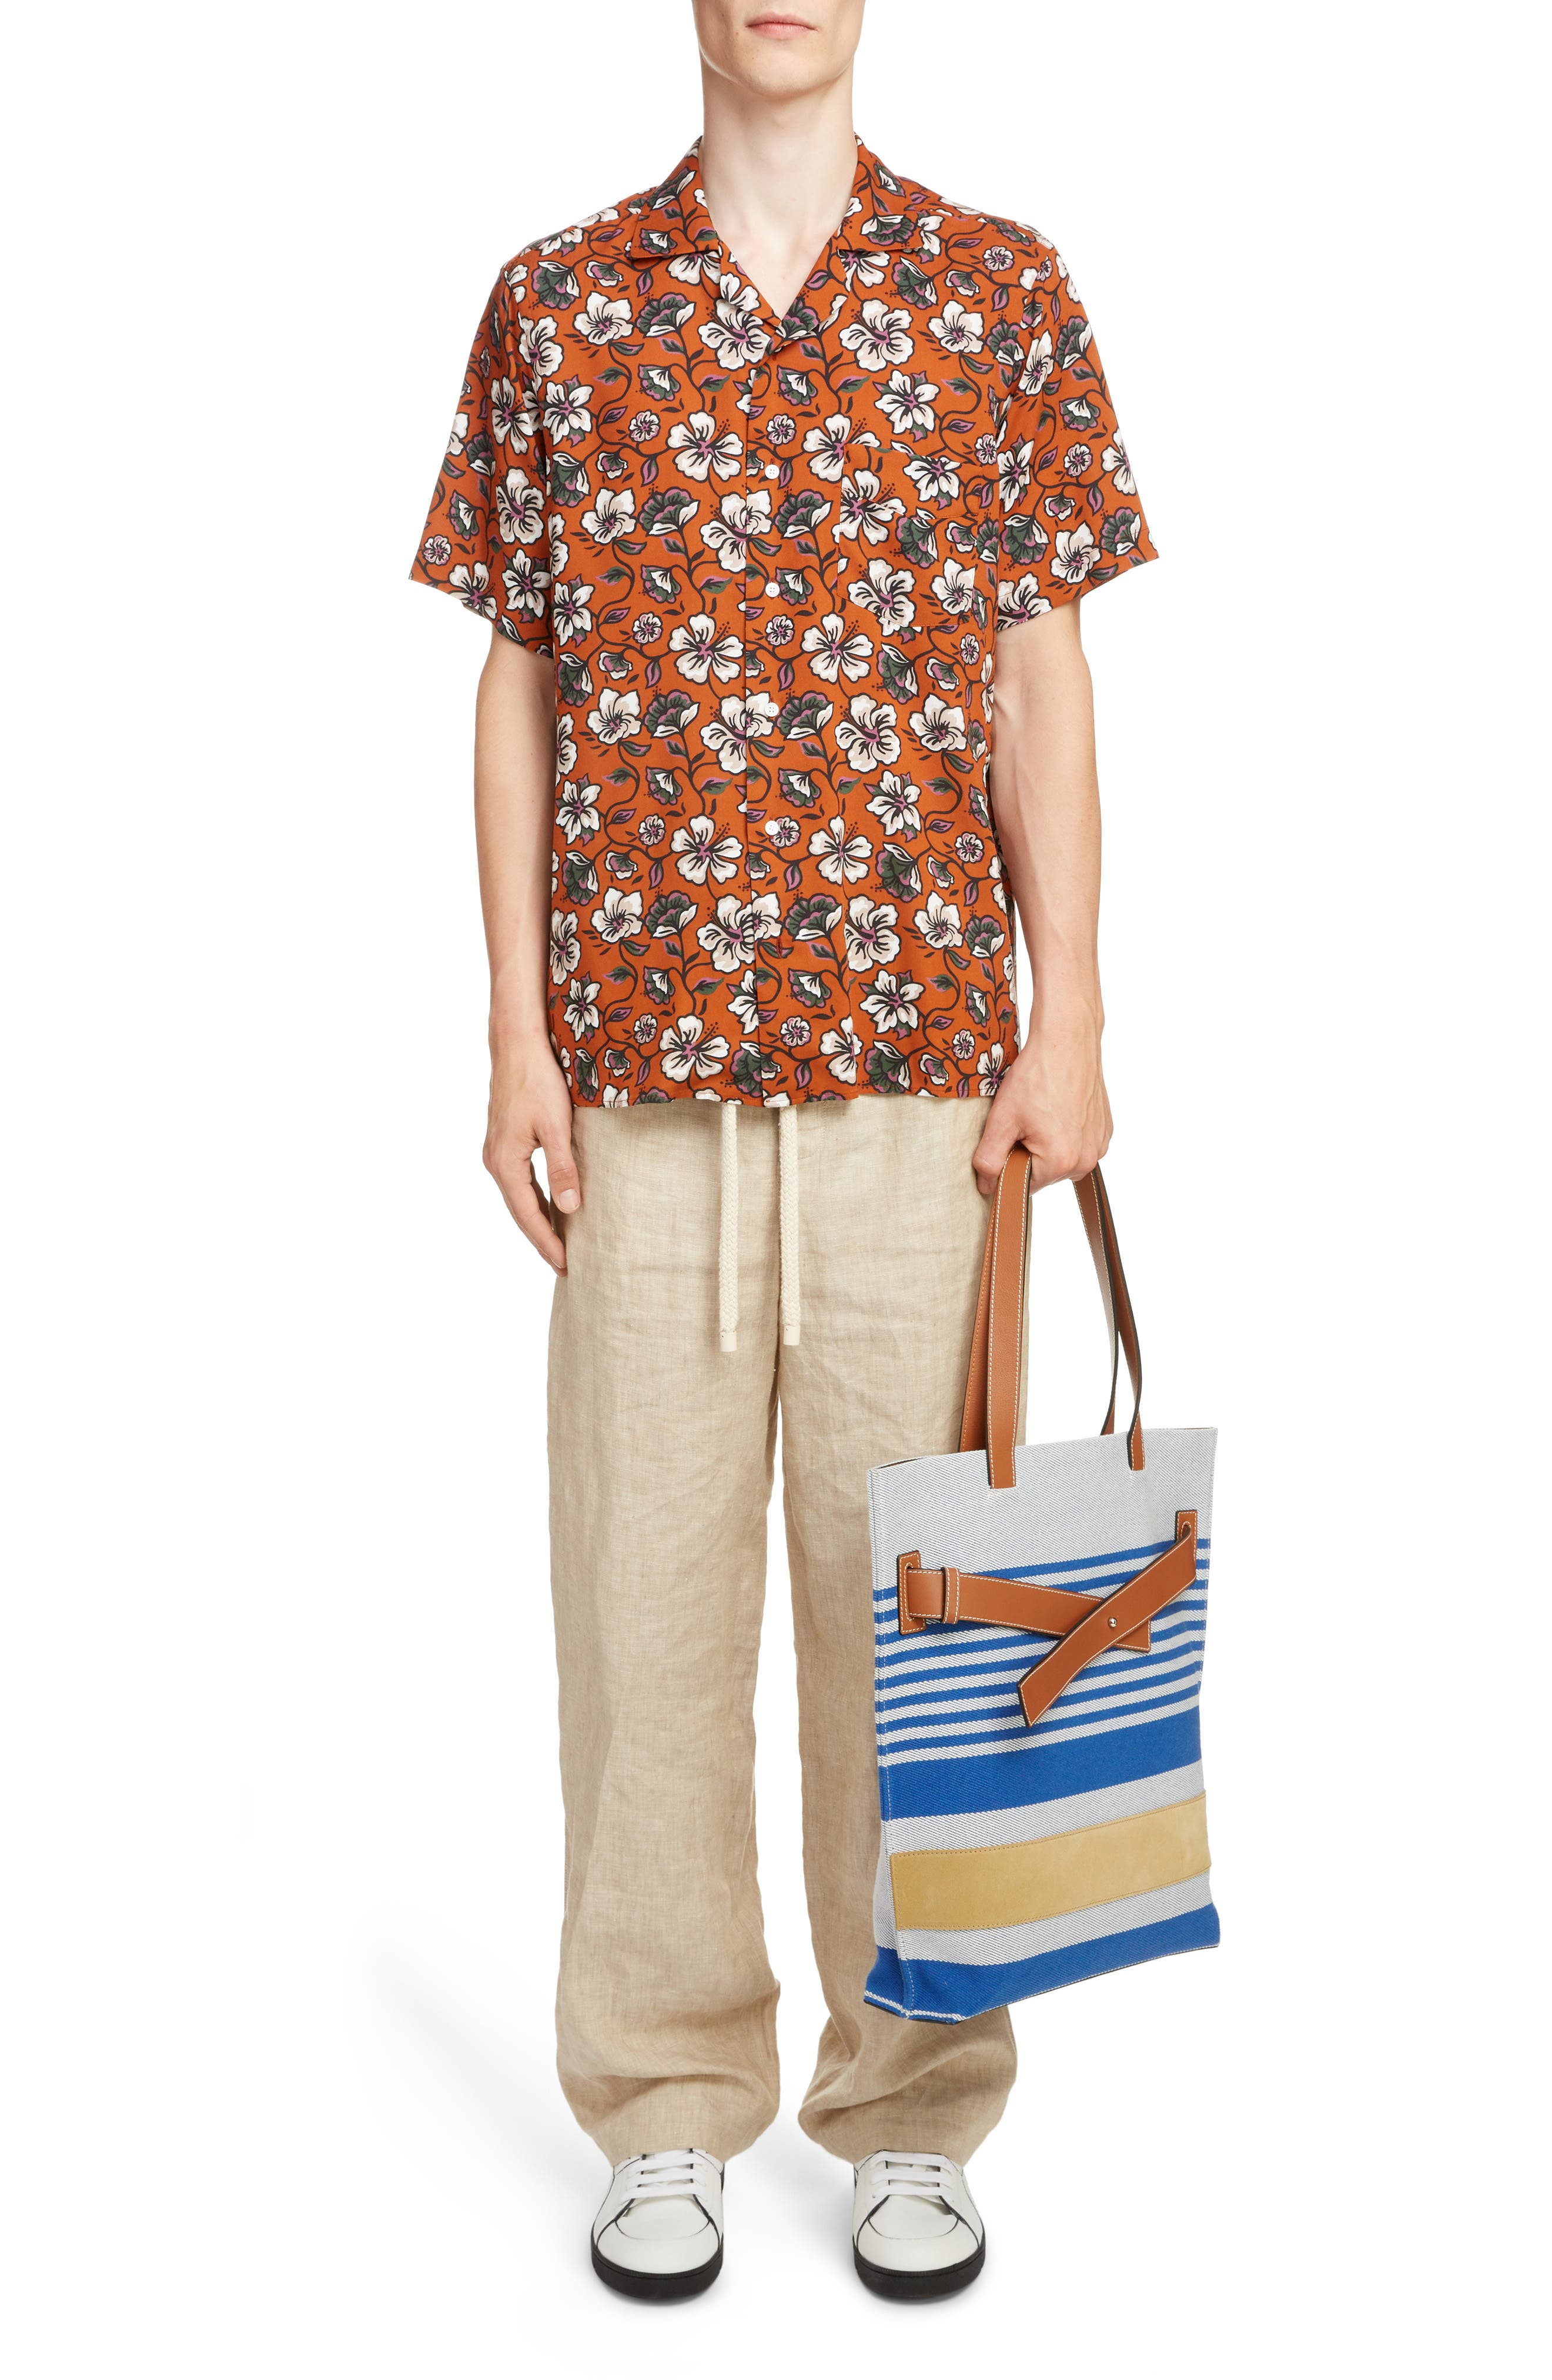 LOEWE,                             Floral Print Camp Shirt,                             Alternate thumbnail 6, color,                             2103-WHITE/ BROWN